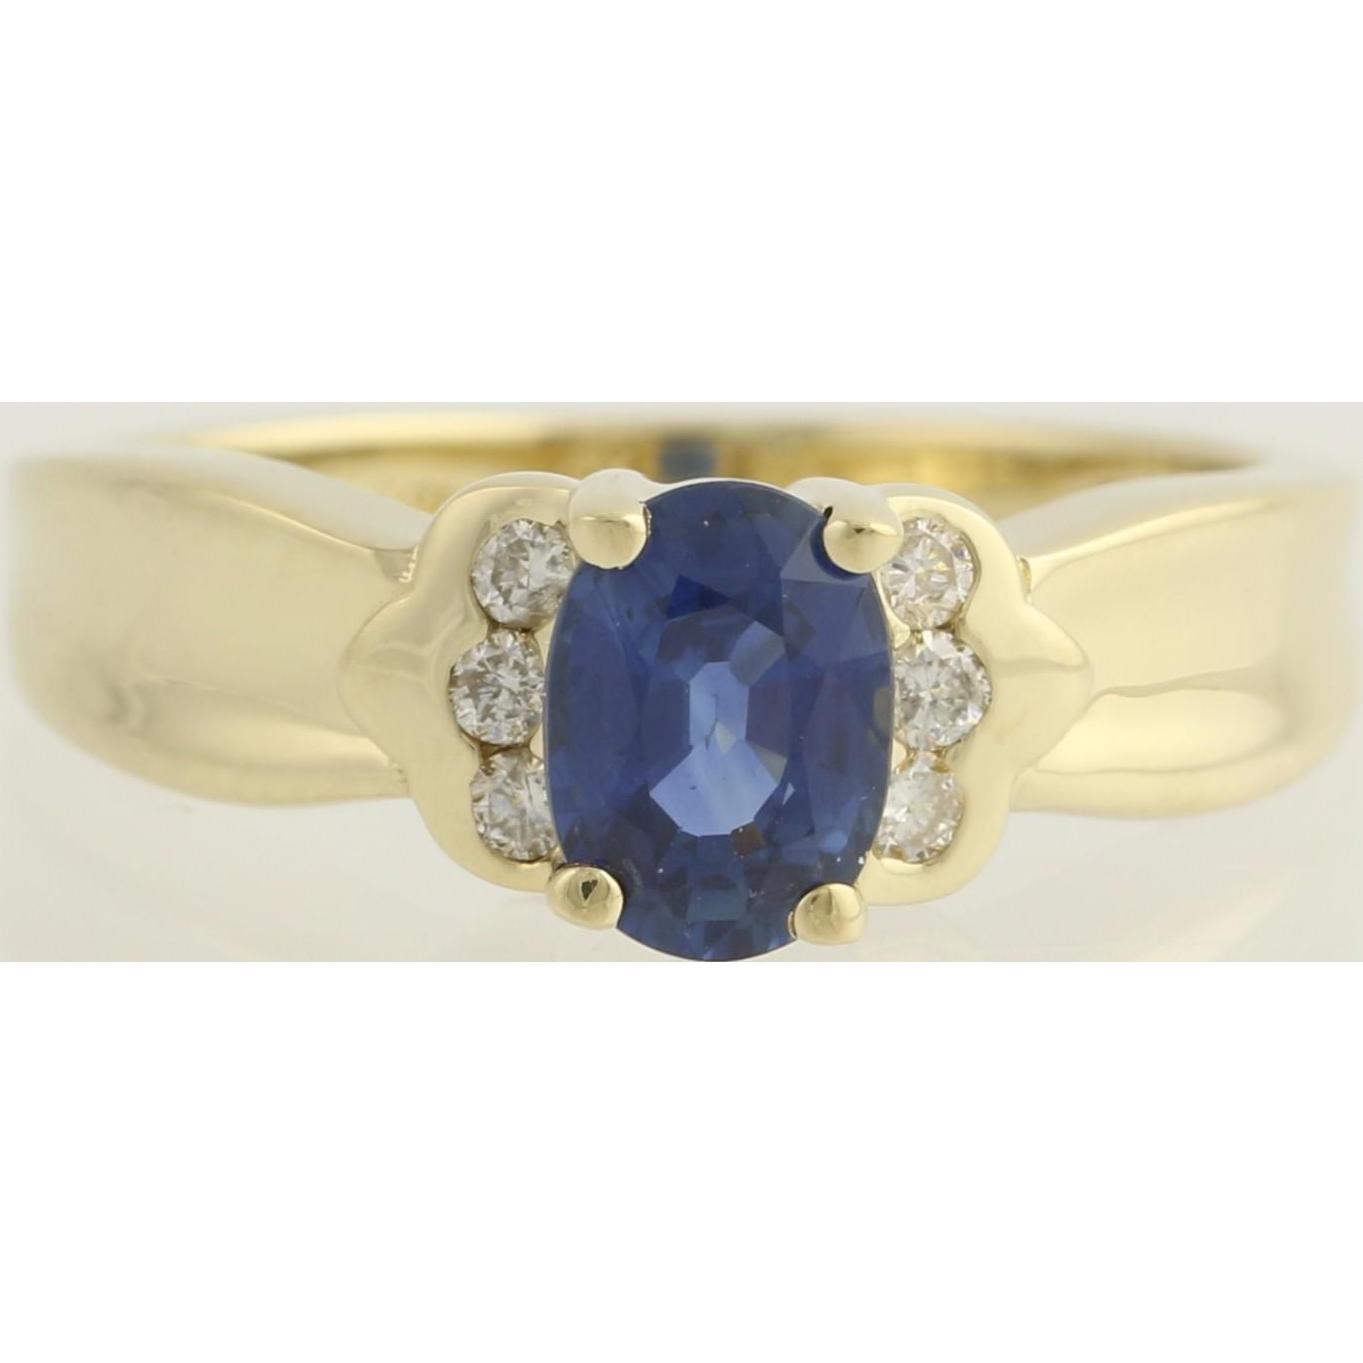 Sapphire & Diamond Ring - 14k Yellow Gold September Birthstone Genuine 1.14ctw